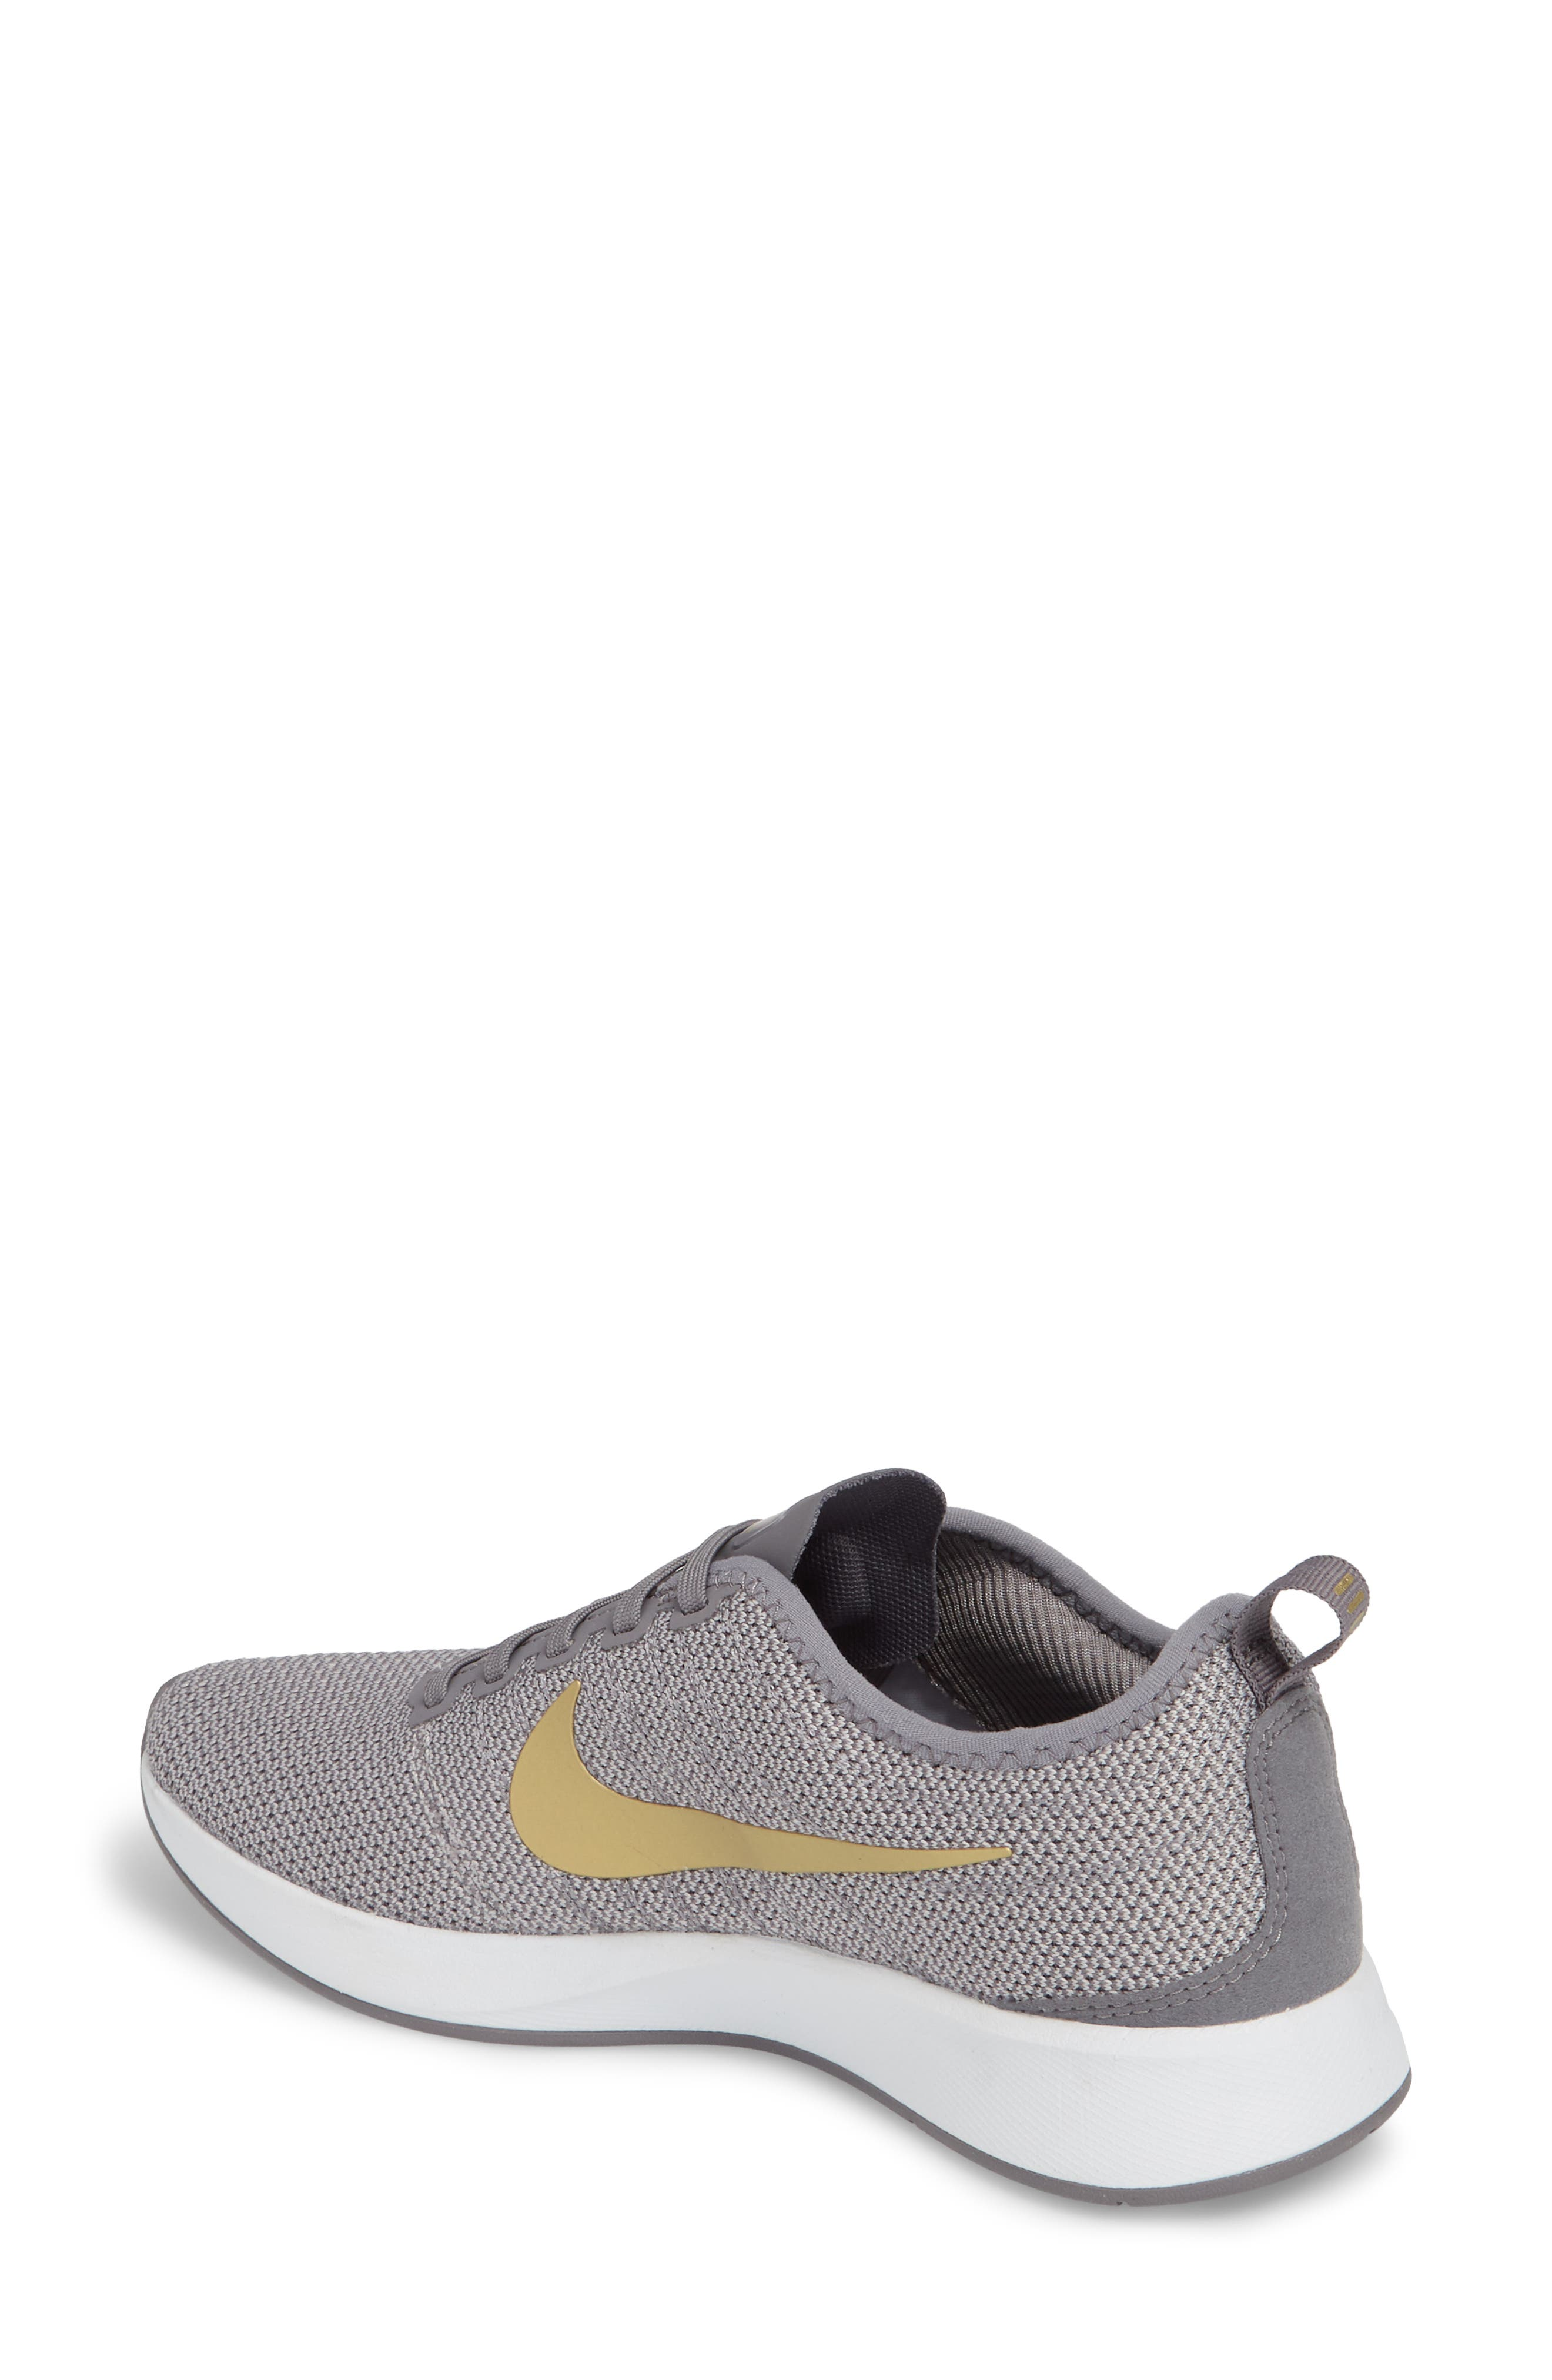 Dualtone Racer SE Sneaker,                             Alternate thumbnail 2, color,                             021